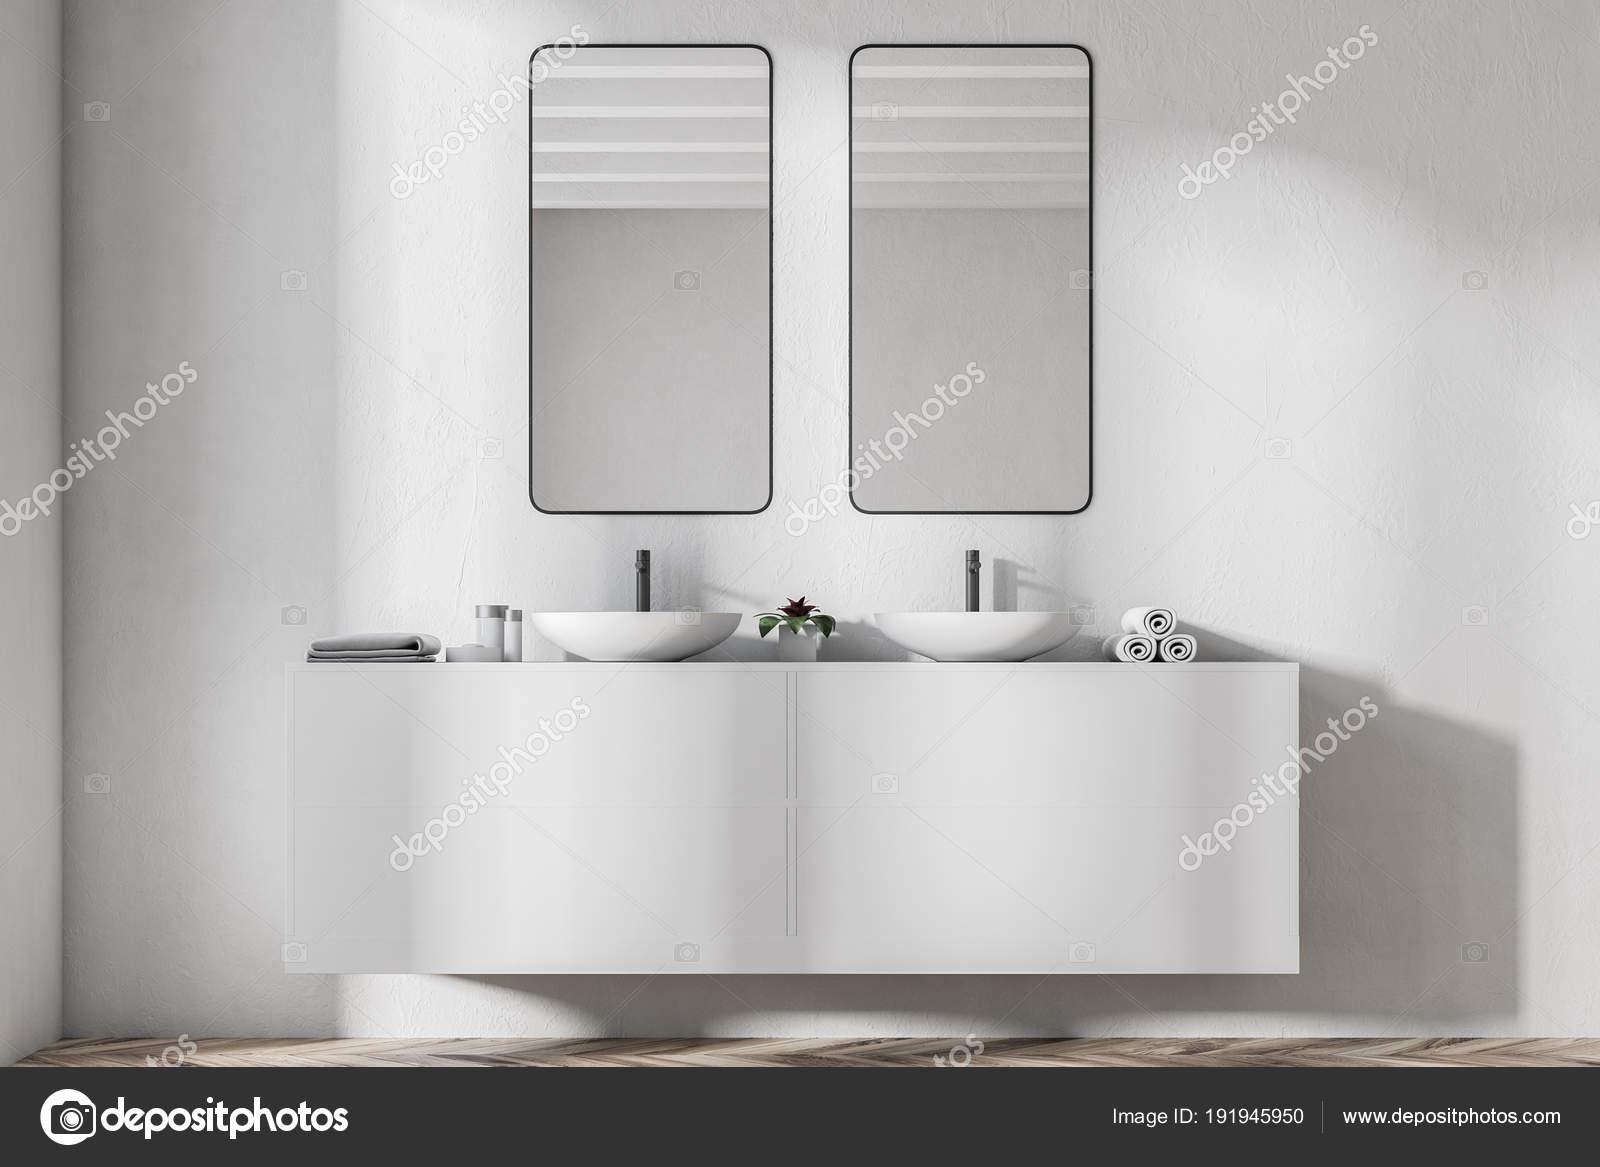 Dubbele badkamer wastafel, verticale spiegels — Stockfoto ...